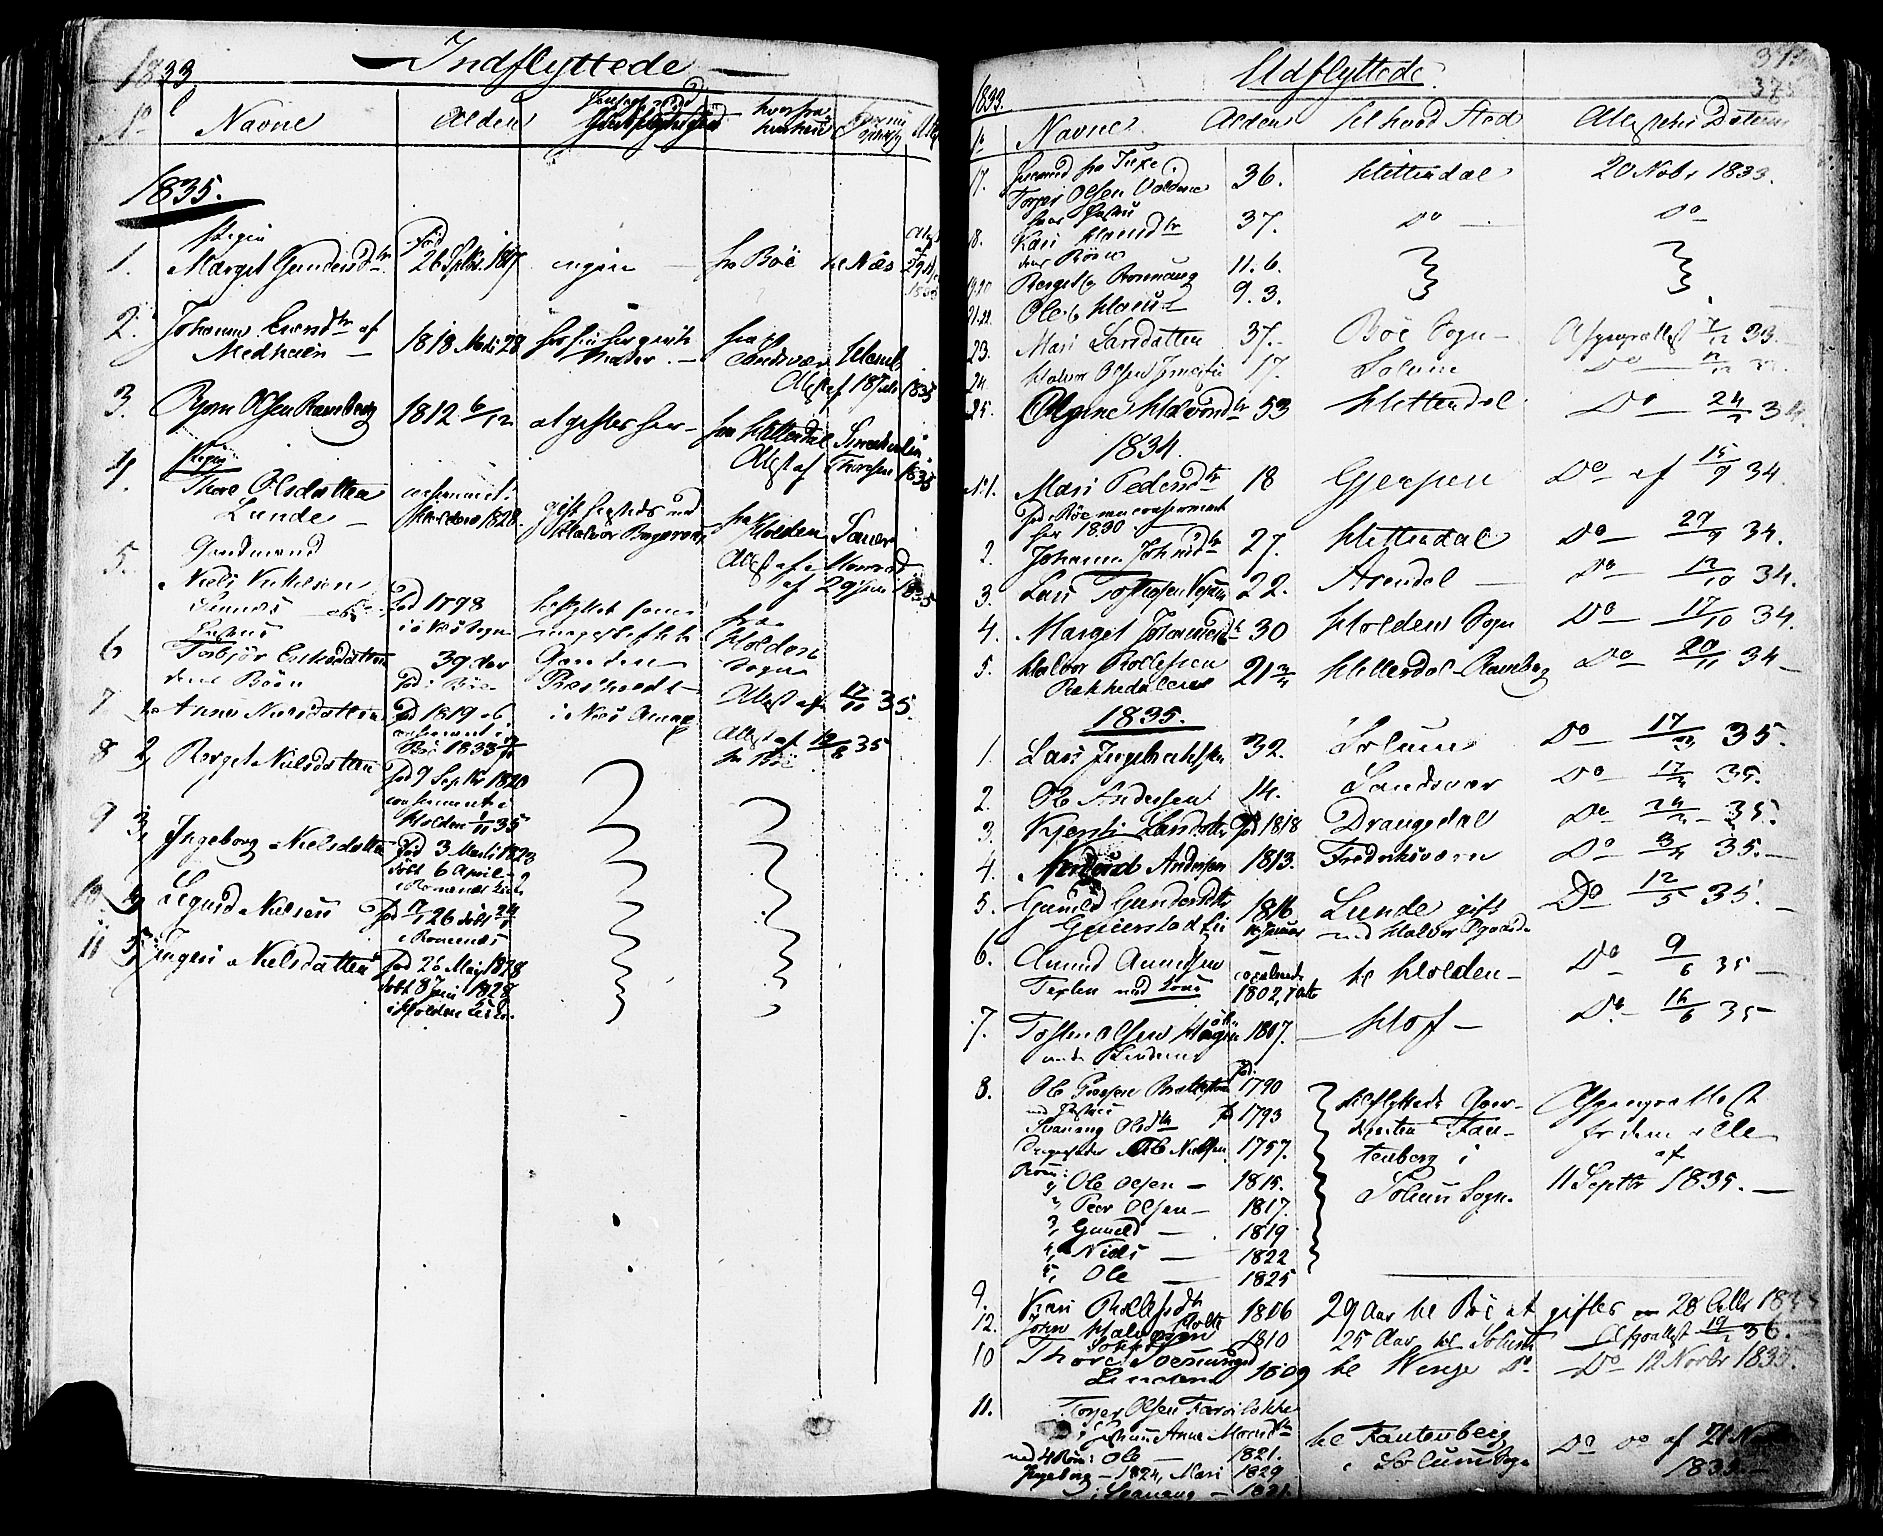 SAKO, Sauherad kirkebøker, F/Fa/L0006: Ministerialbok nr. I 6, 1827-1850, s. 375